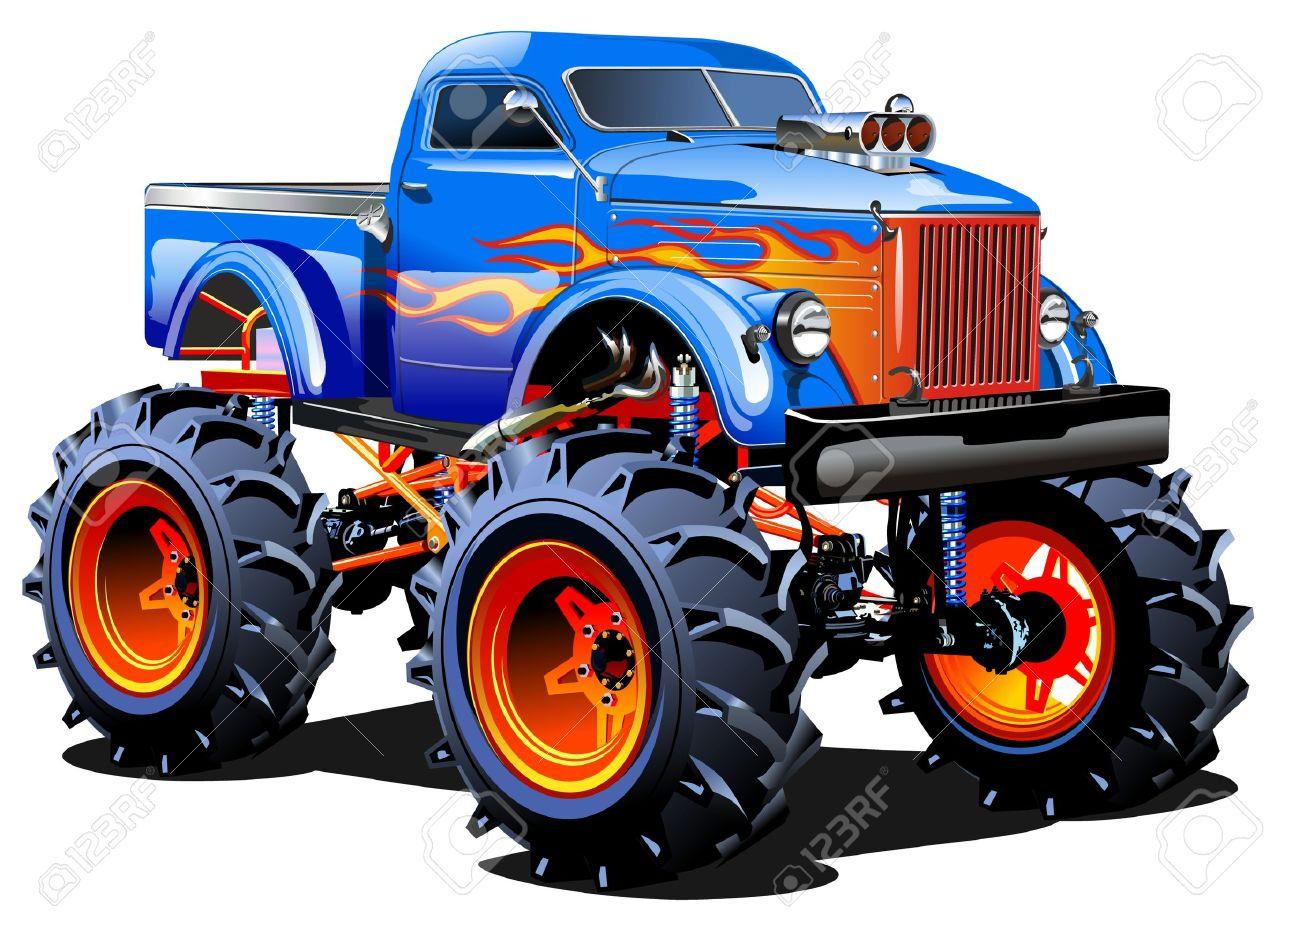 cartoon monster truck royalty free cliparts vectors and stock rh 123rf com monster truck clip art images monster jam clip art